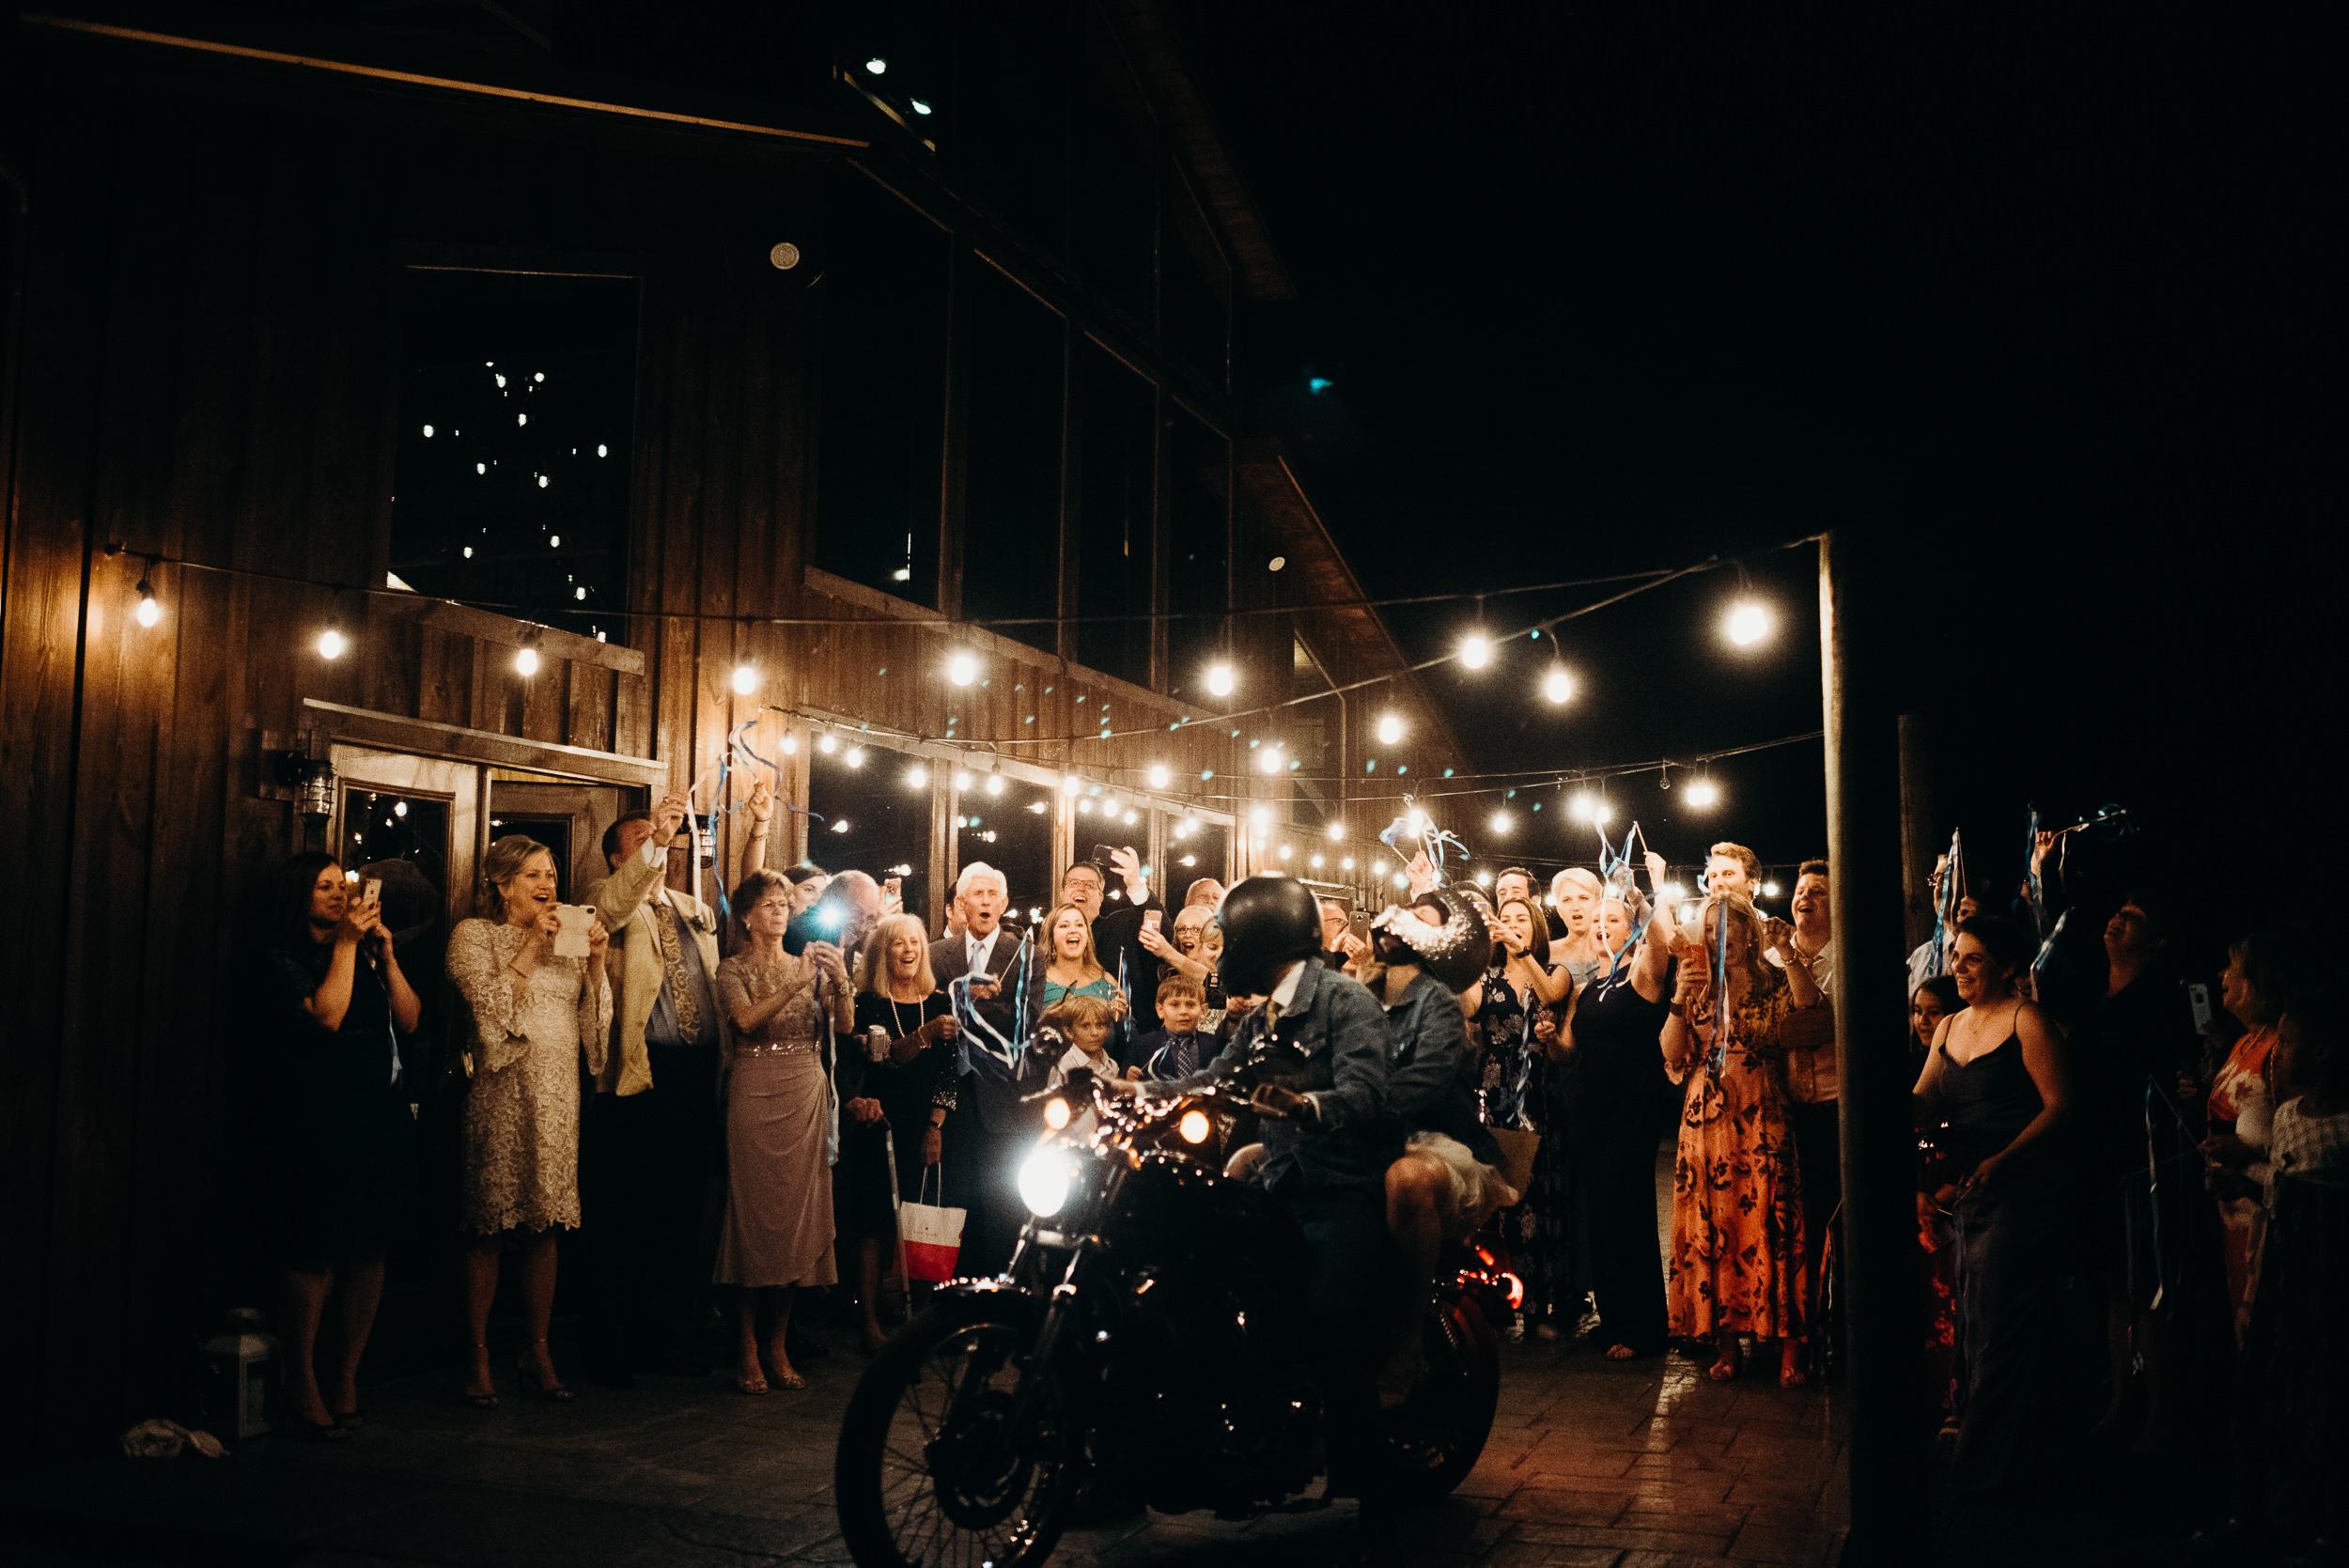 247-faithbrooke-barn-vineyard-wedding-photo-mustard-yellow-navy-motorcycle-MMG_0869.jpg